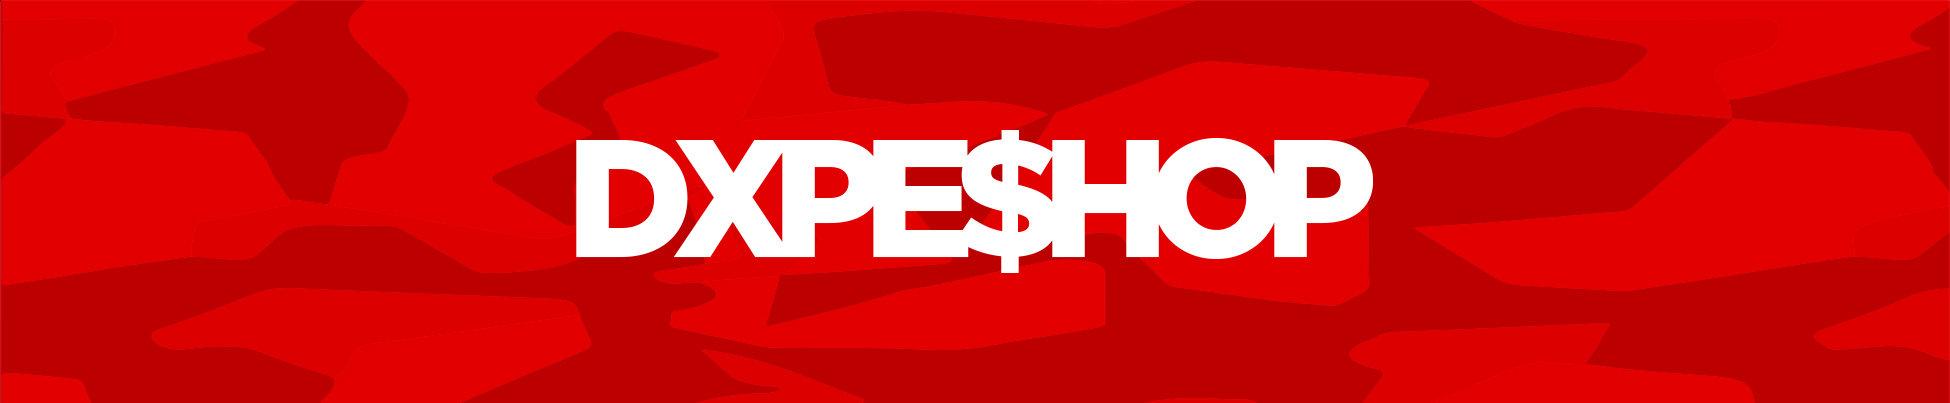 dxpe shop banner.jpg